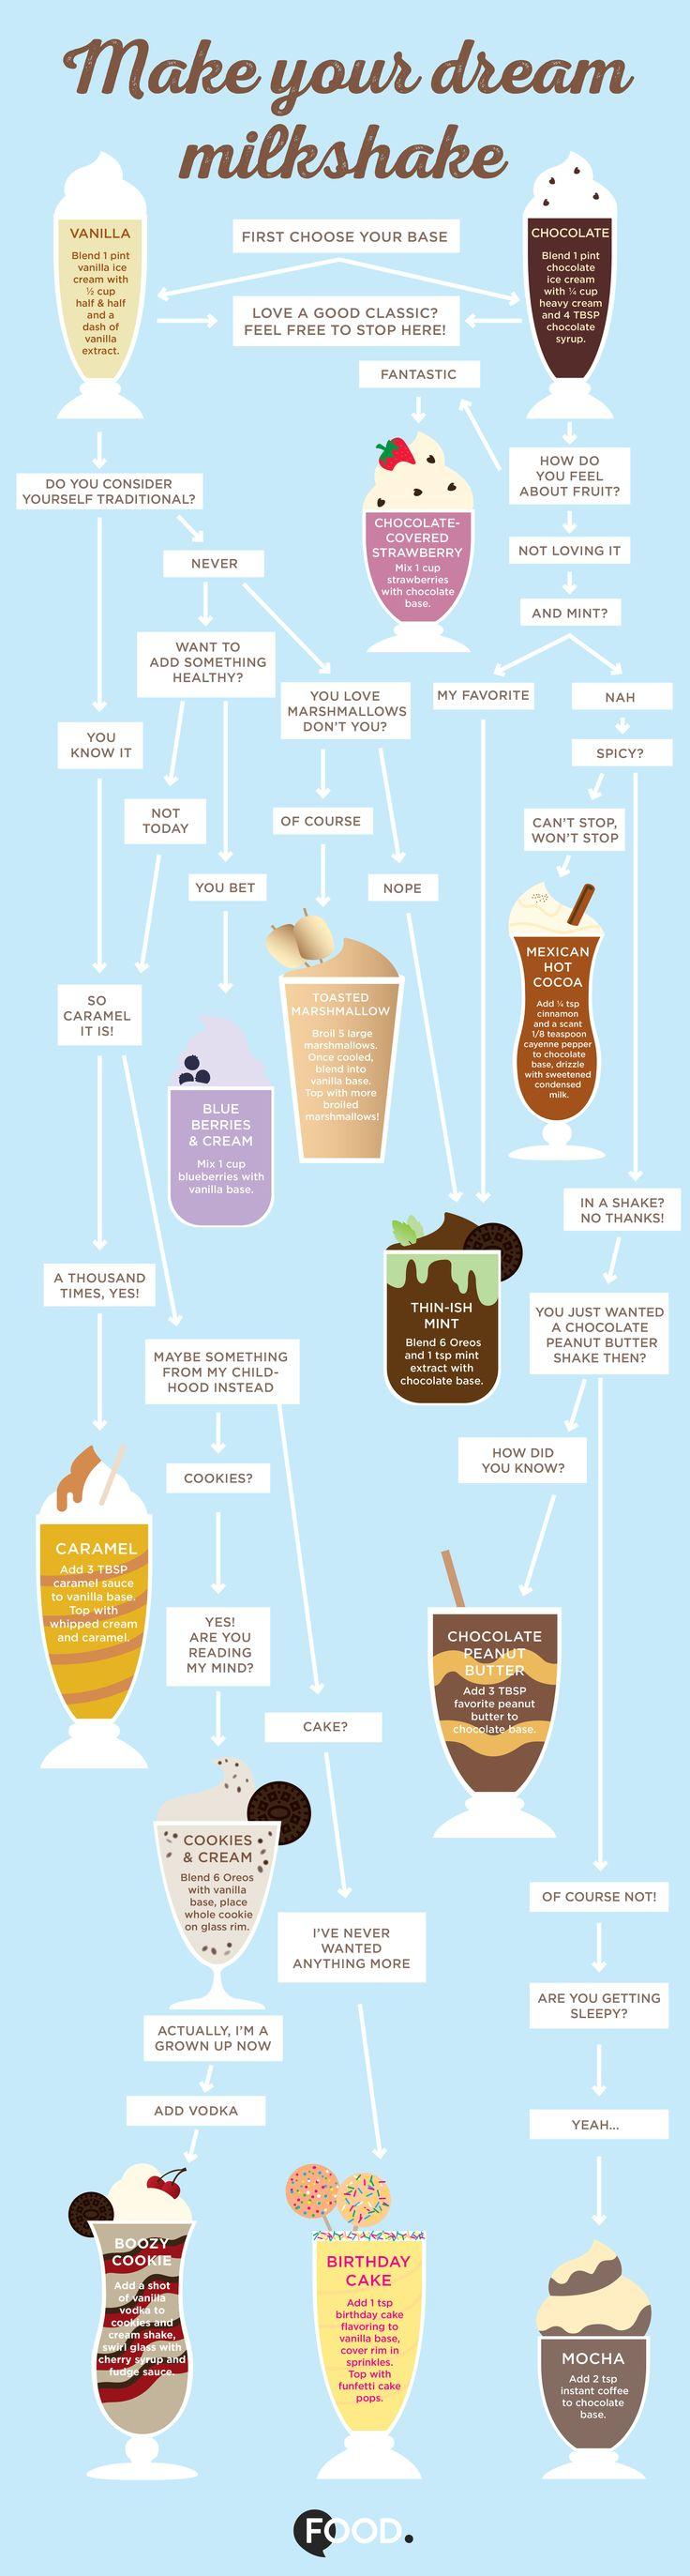 Milkshake Recipe Flowchart - Food.com